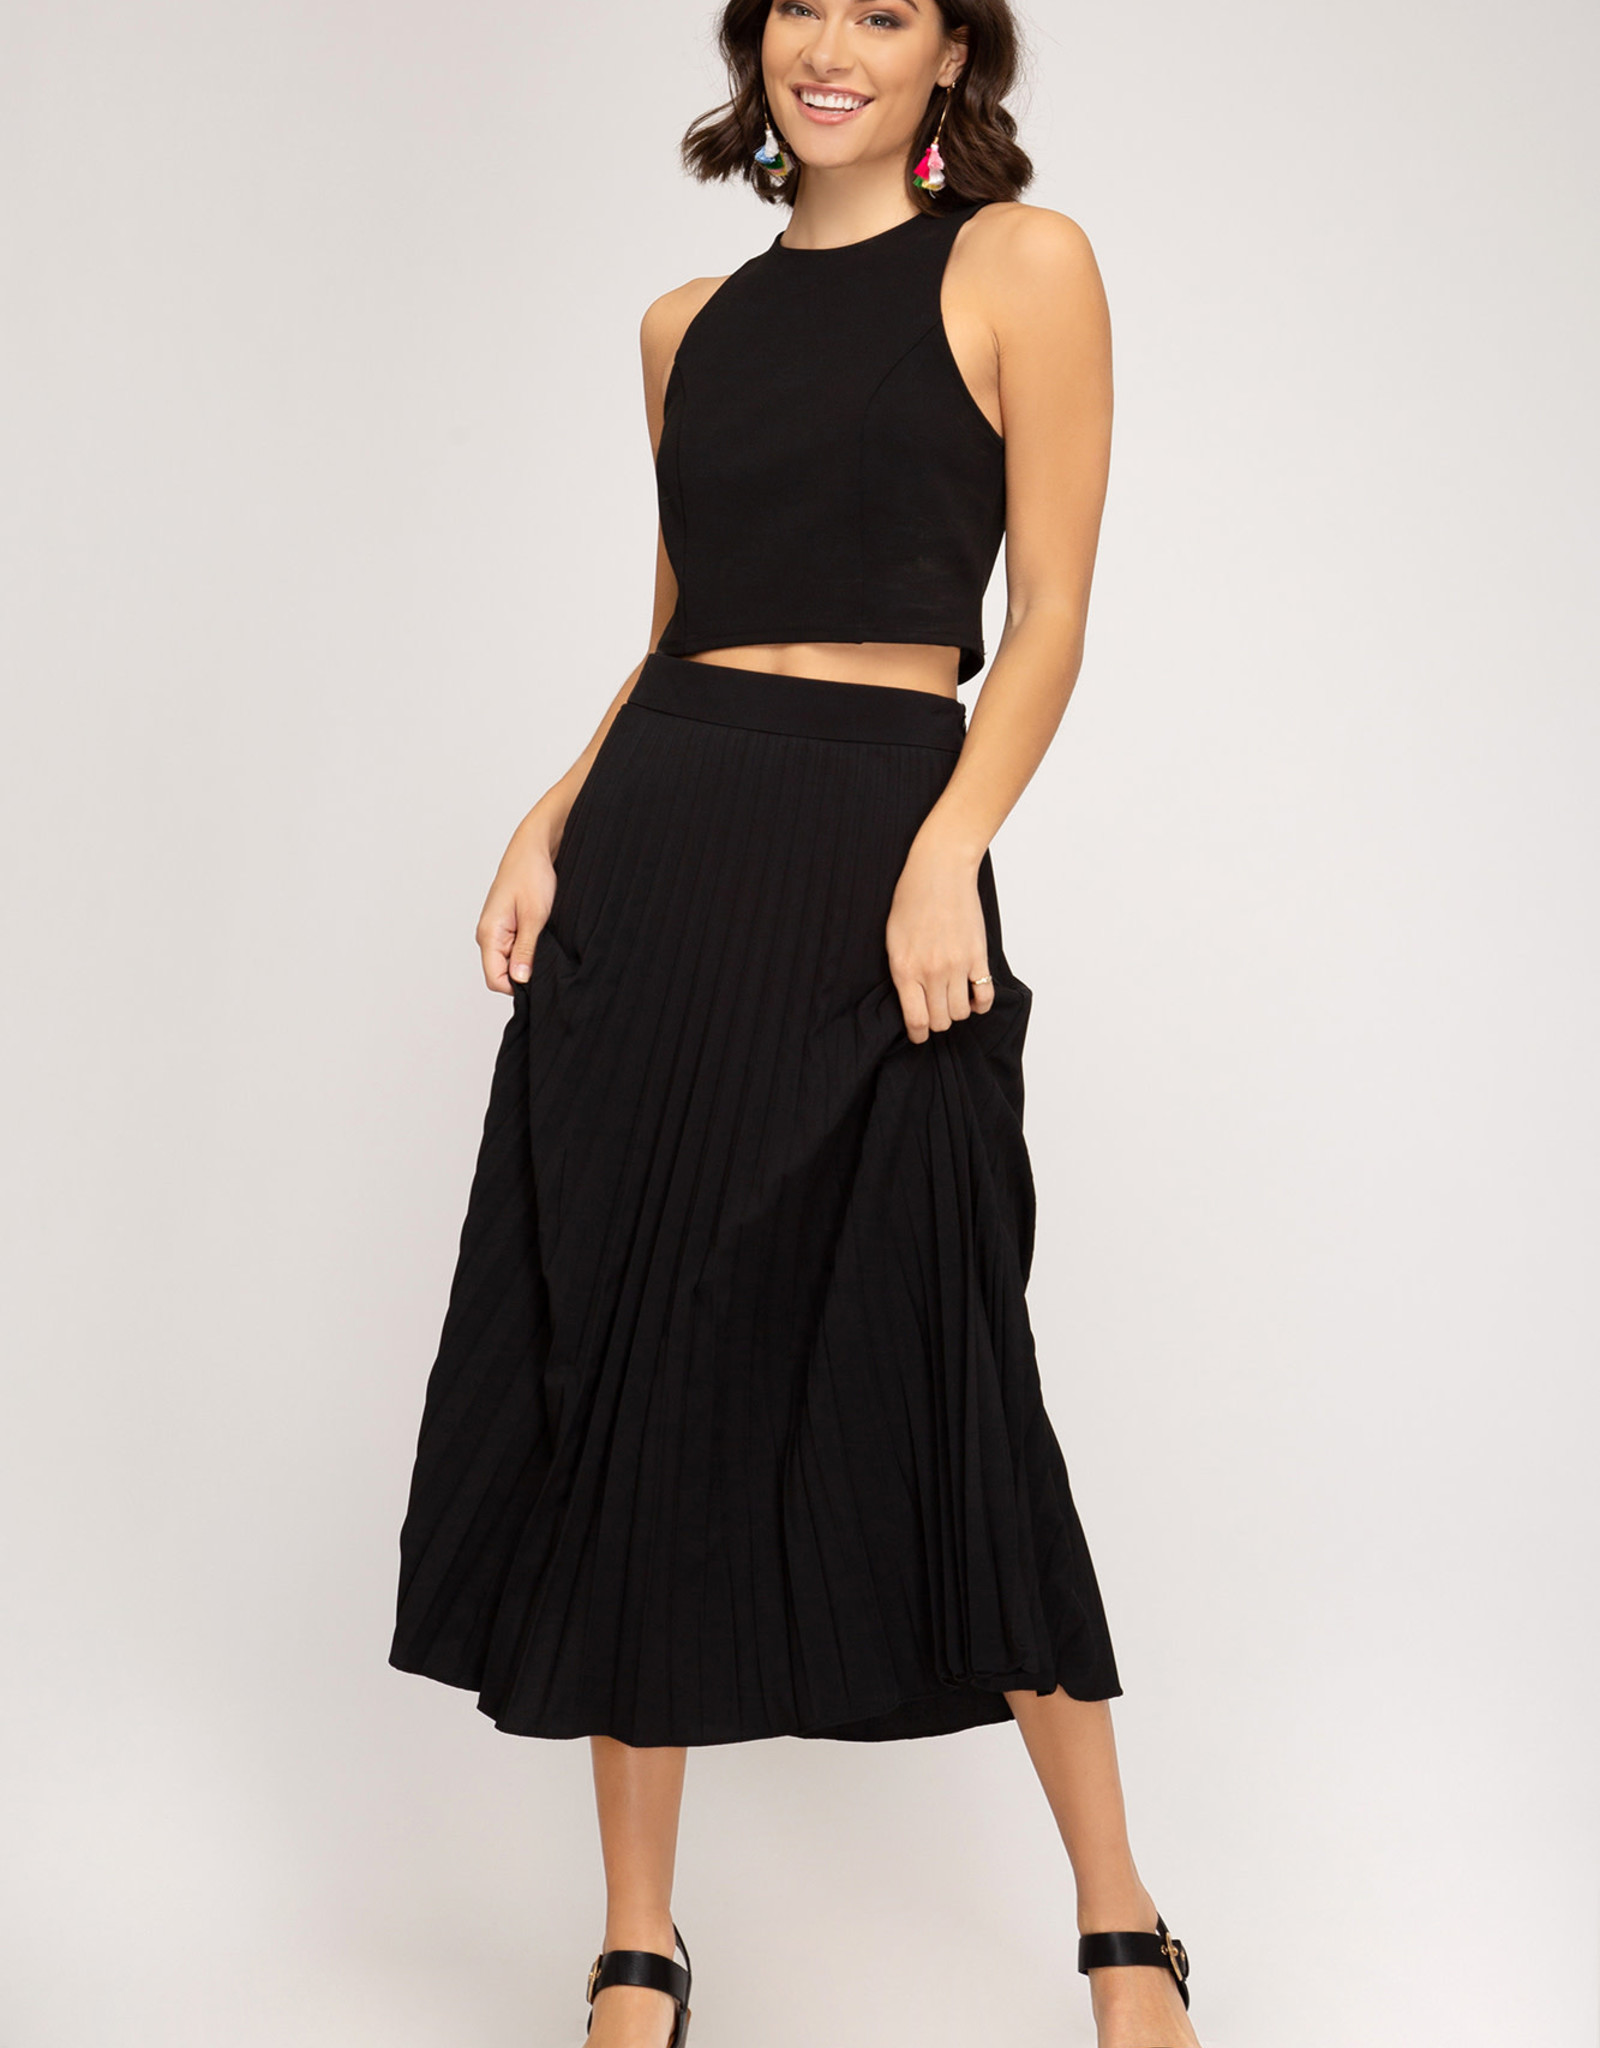 LeBLANC finds PLEATED skirt, Royal or Black